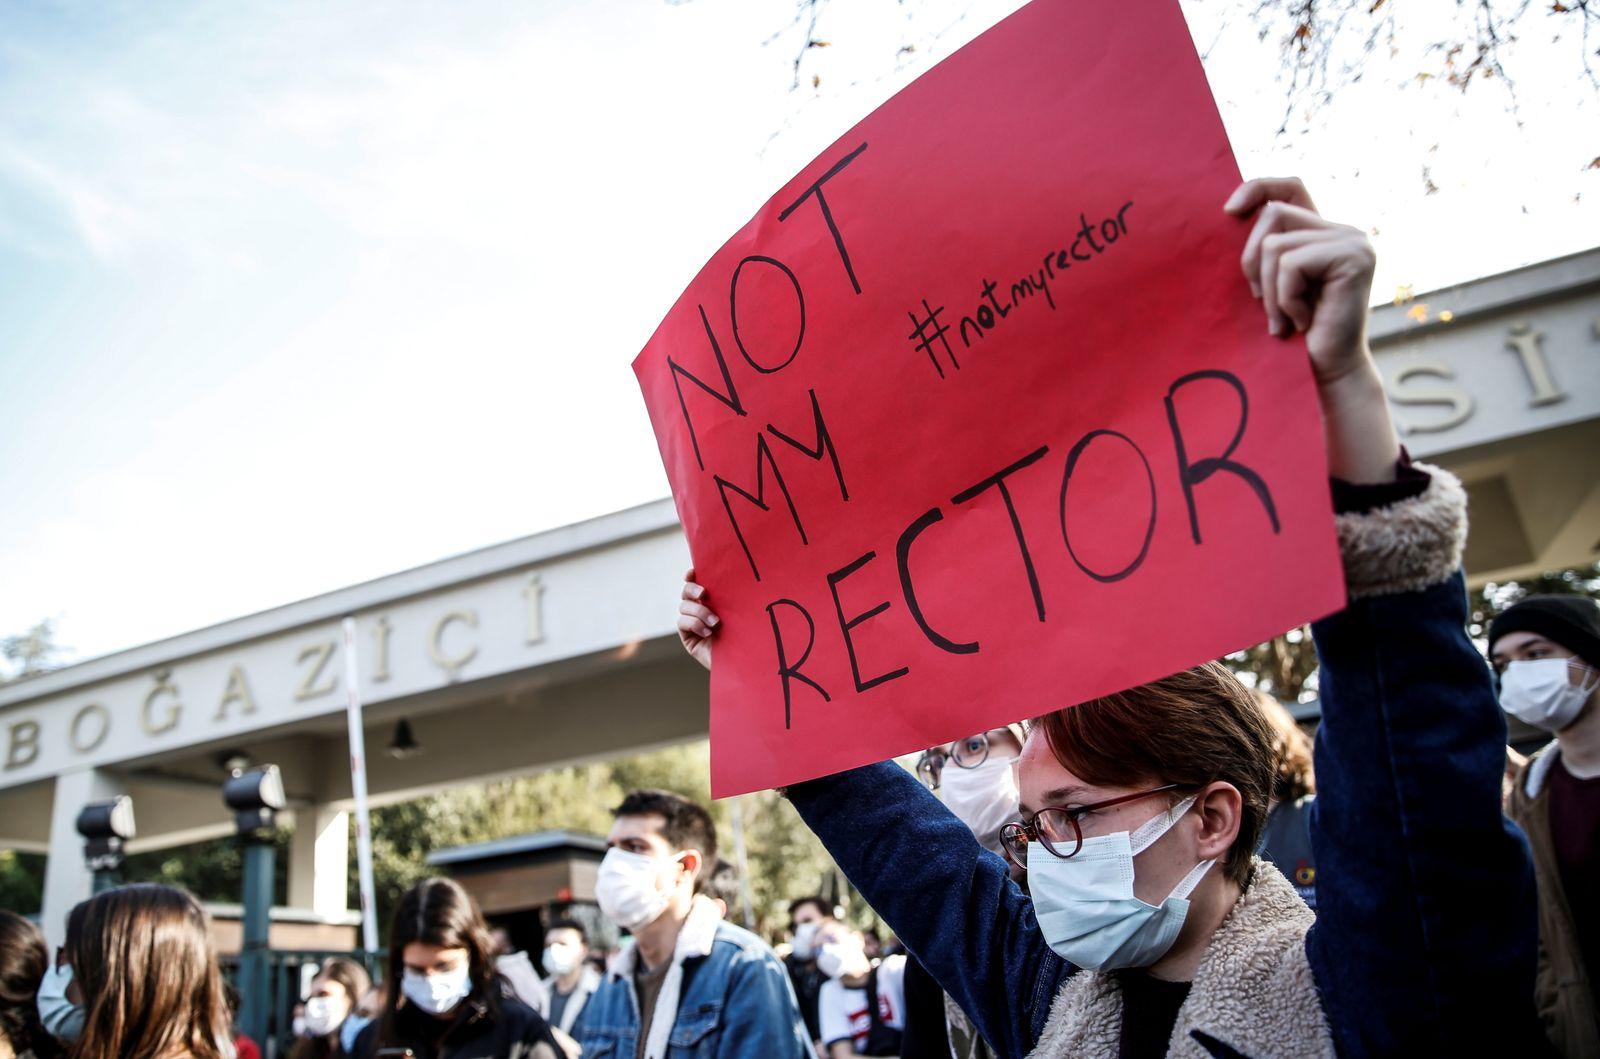 Students of Bogazici University protest in Istanbul